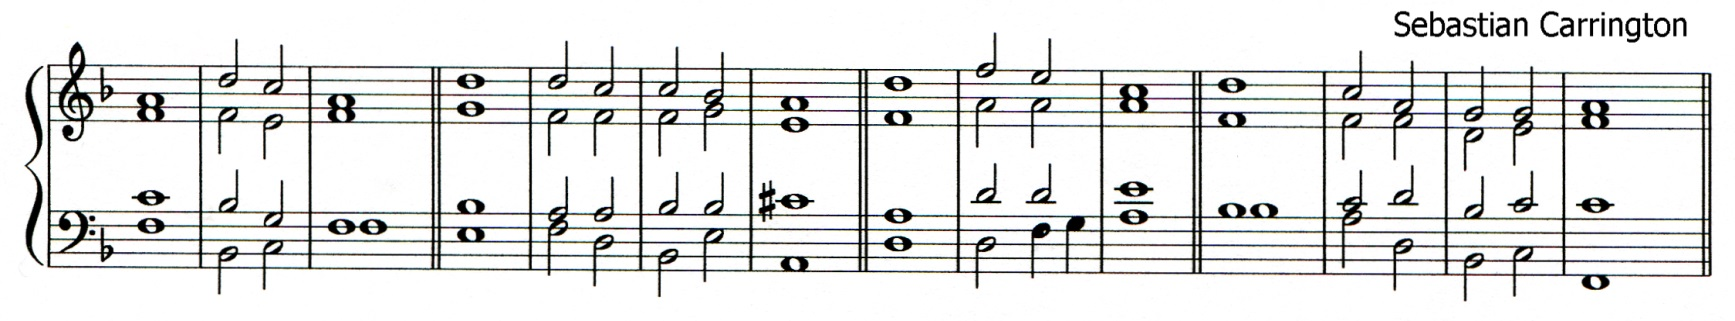 Double chant in F major by Sebastian Carrington